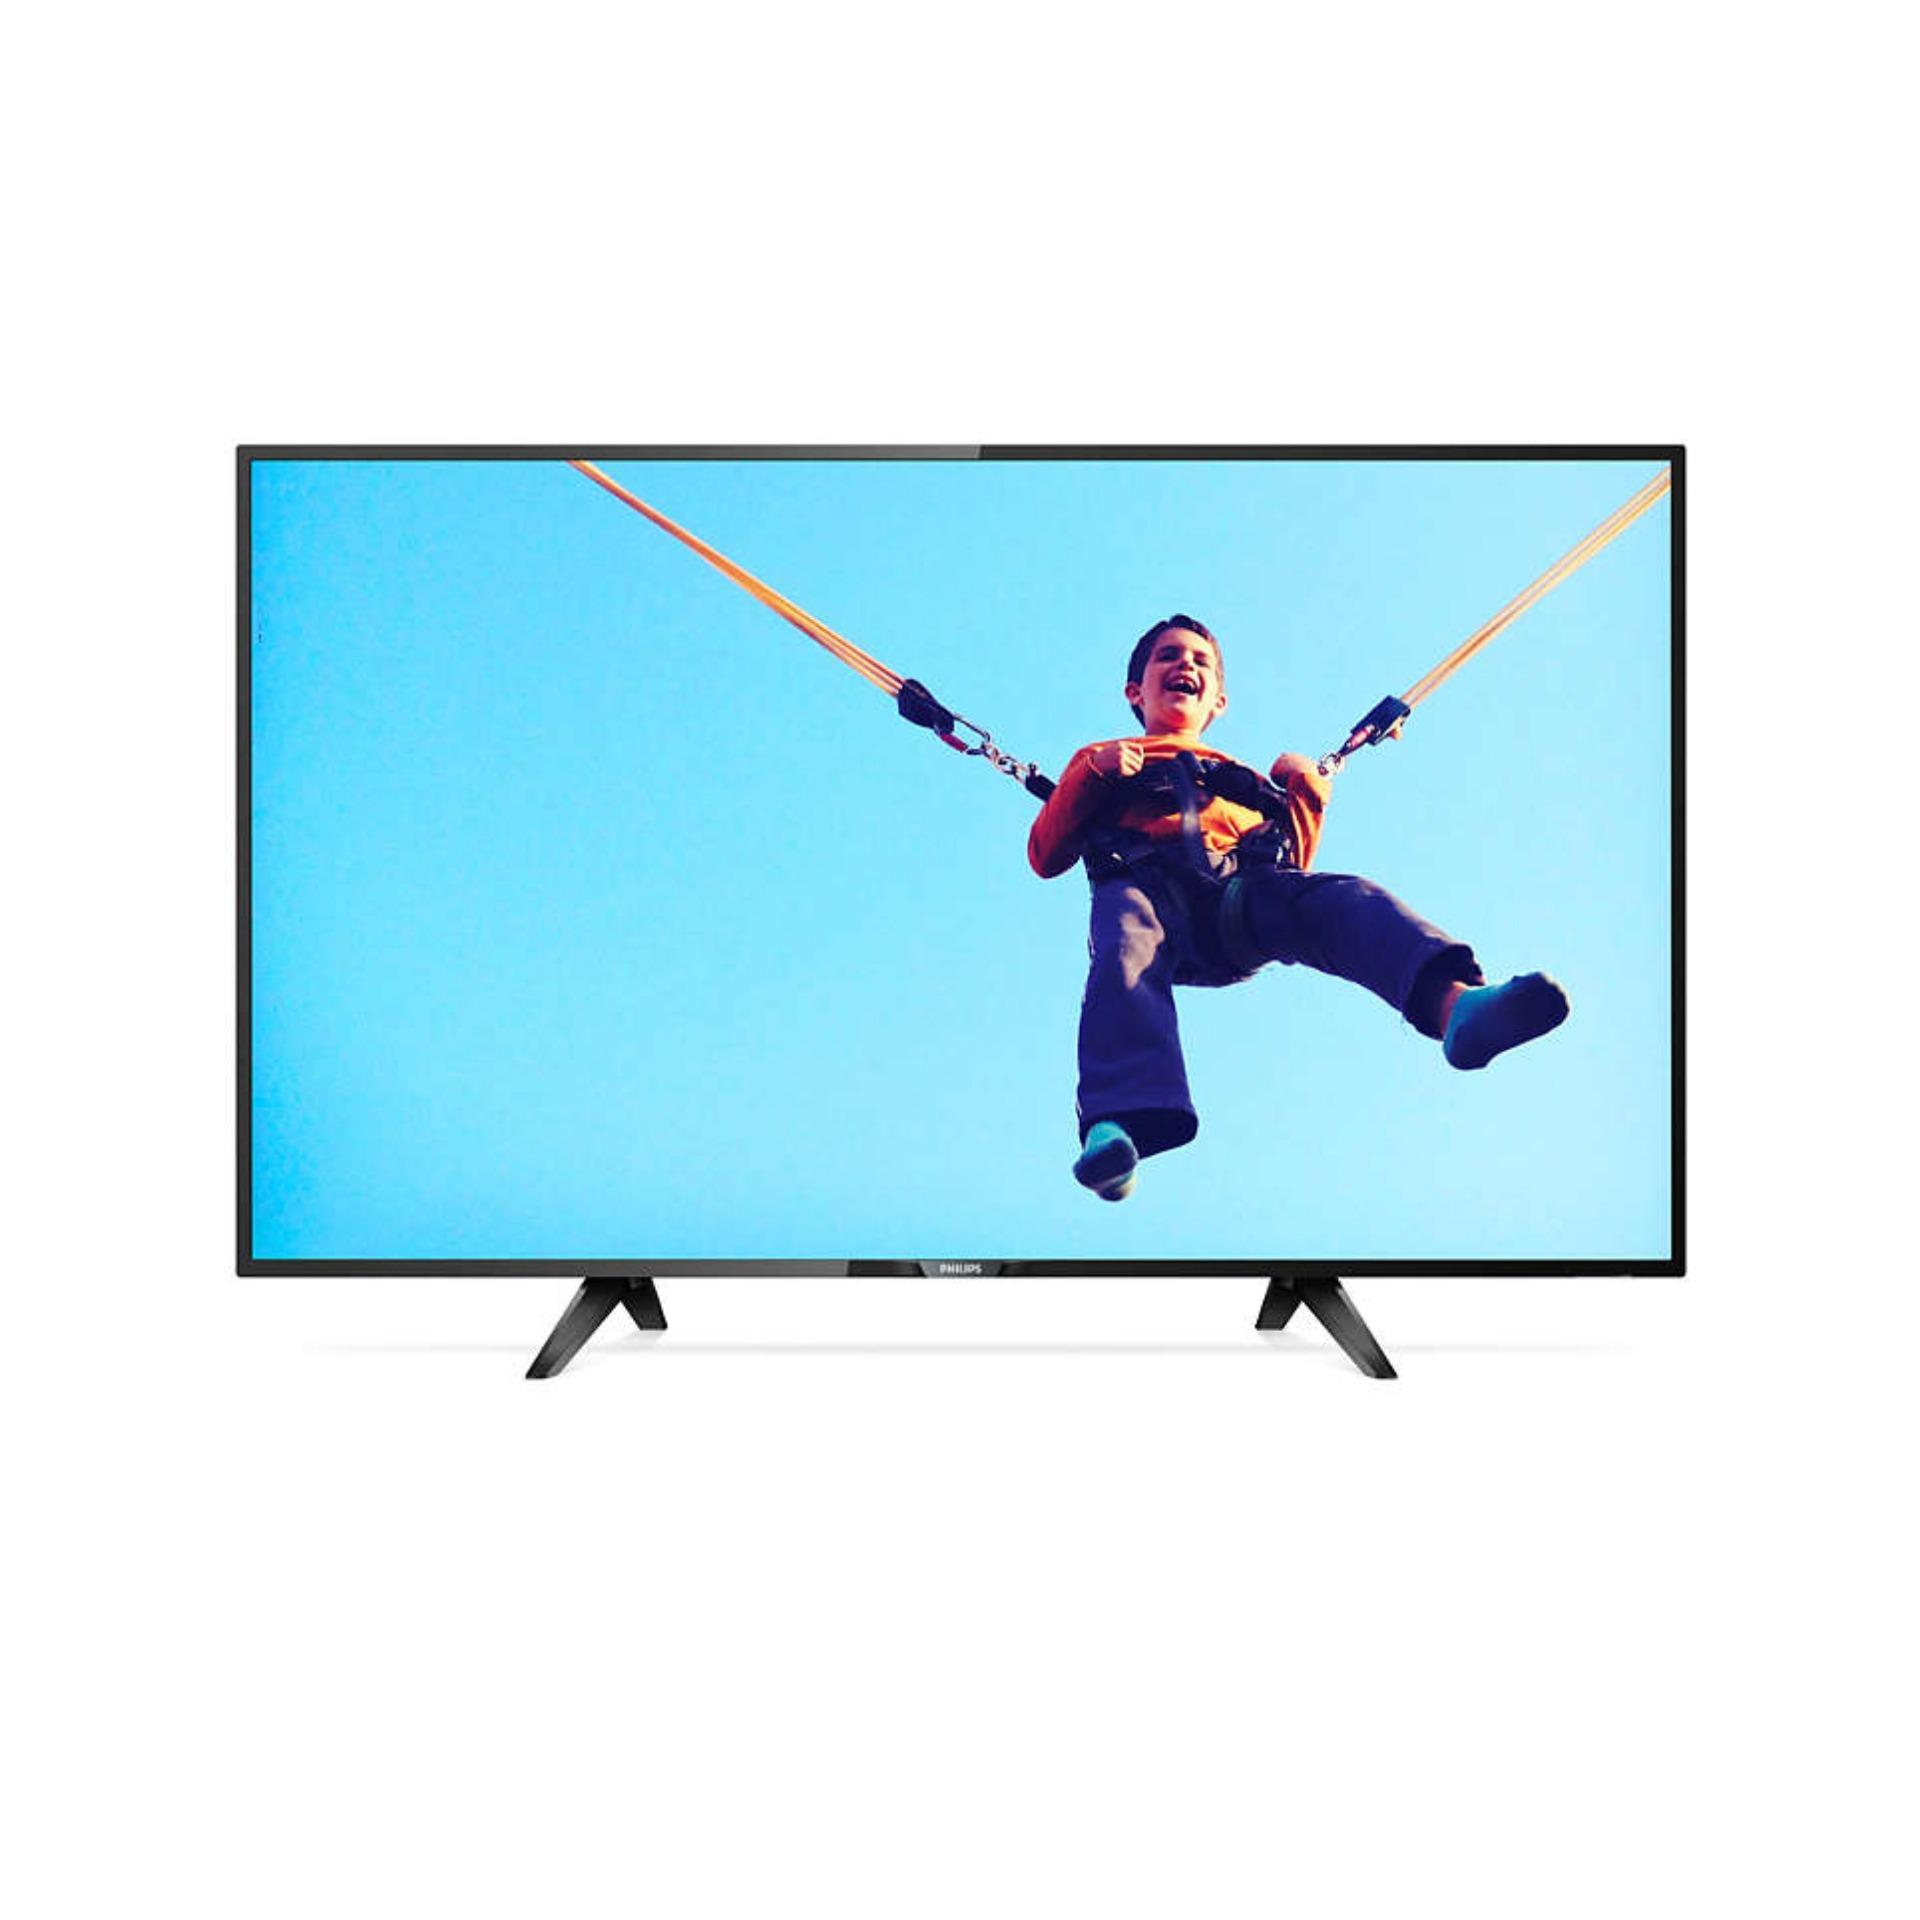 Philips 32PHT5102 Digital / Smart HD TV, USB, Speaker, Dual Band ...